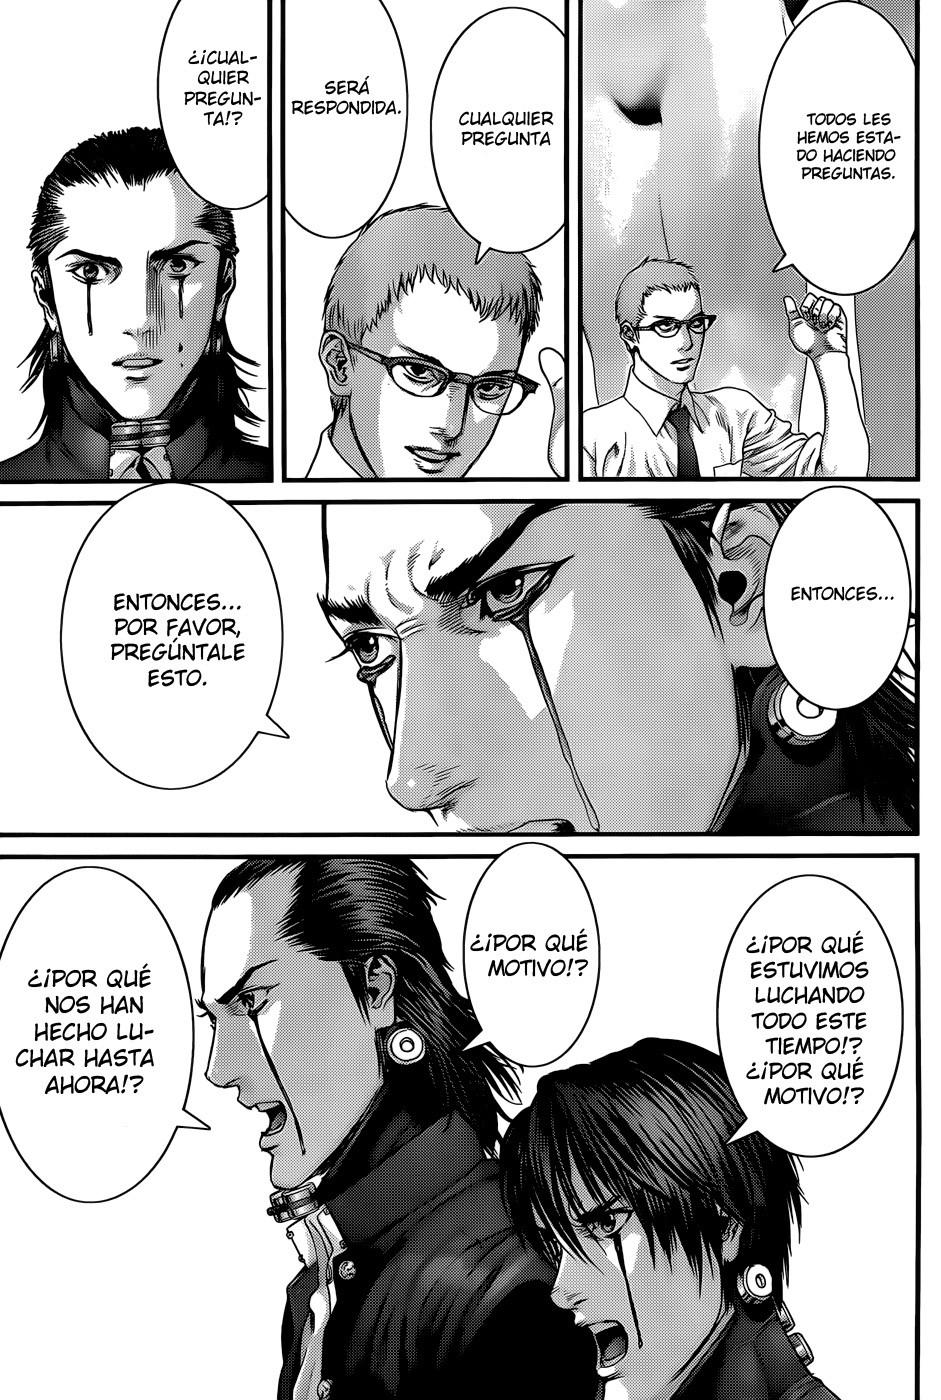 Manga Gantz capitulo 369 12